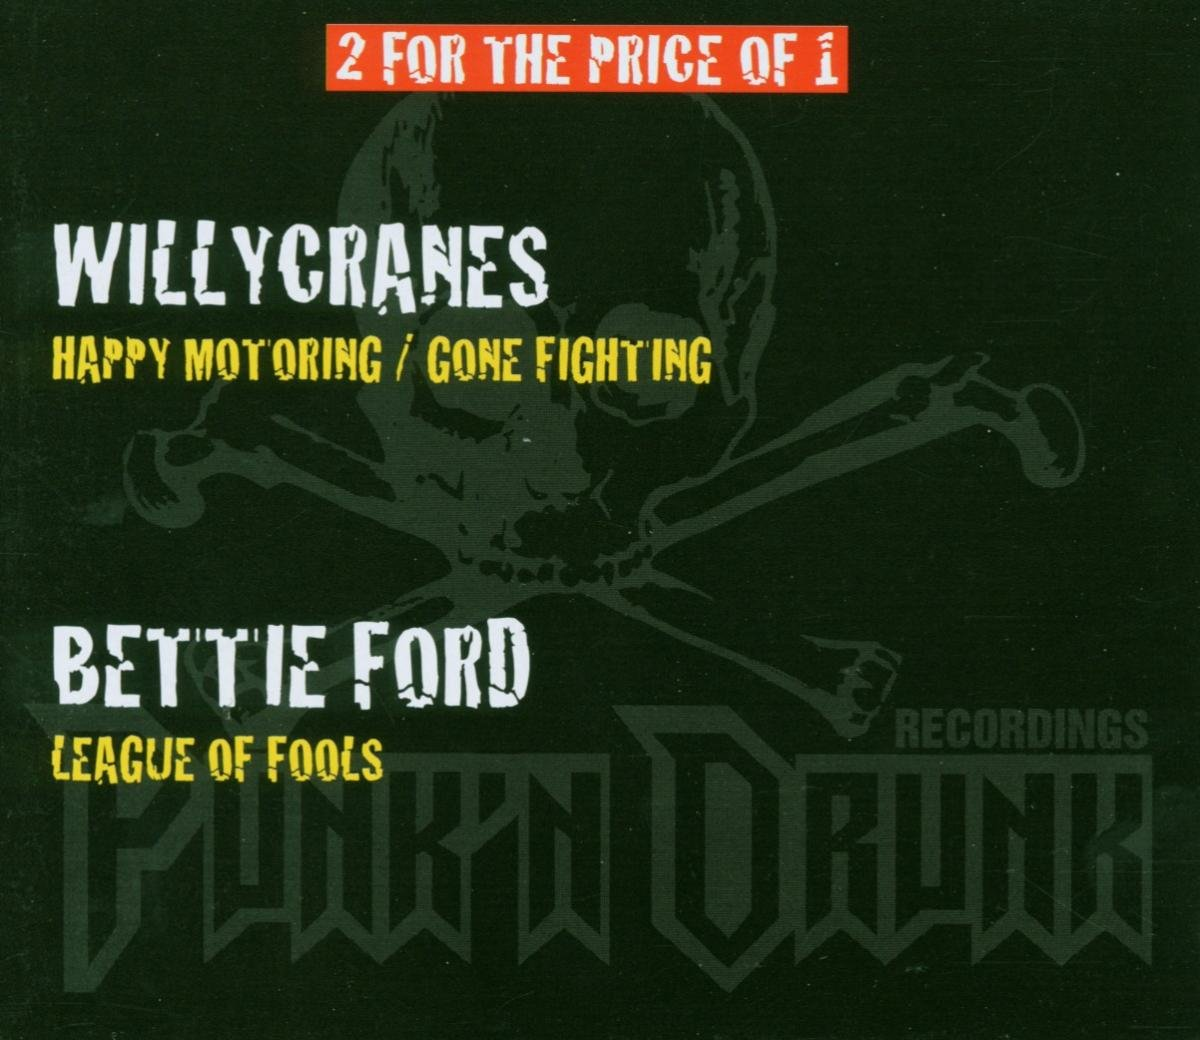 Ford Bettie,Willycranes Bettie Ford / Willycranes. Happy Motoring, Gone Fighting (3 CD)